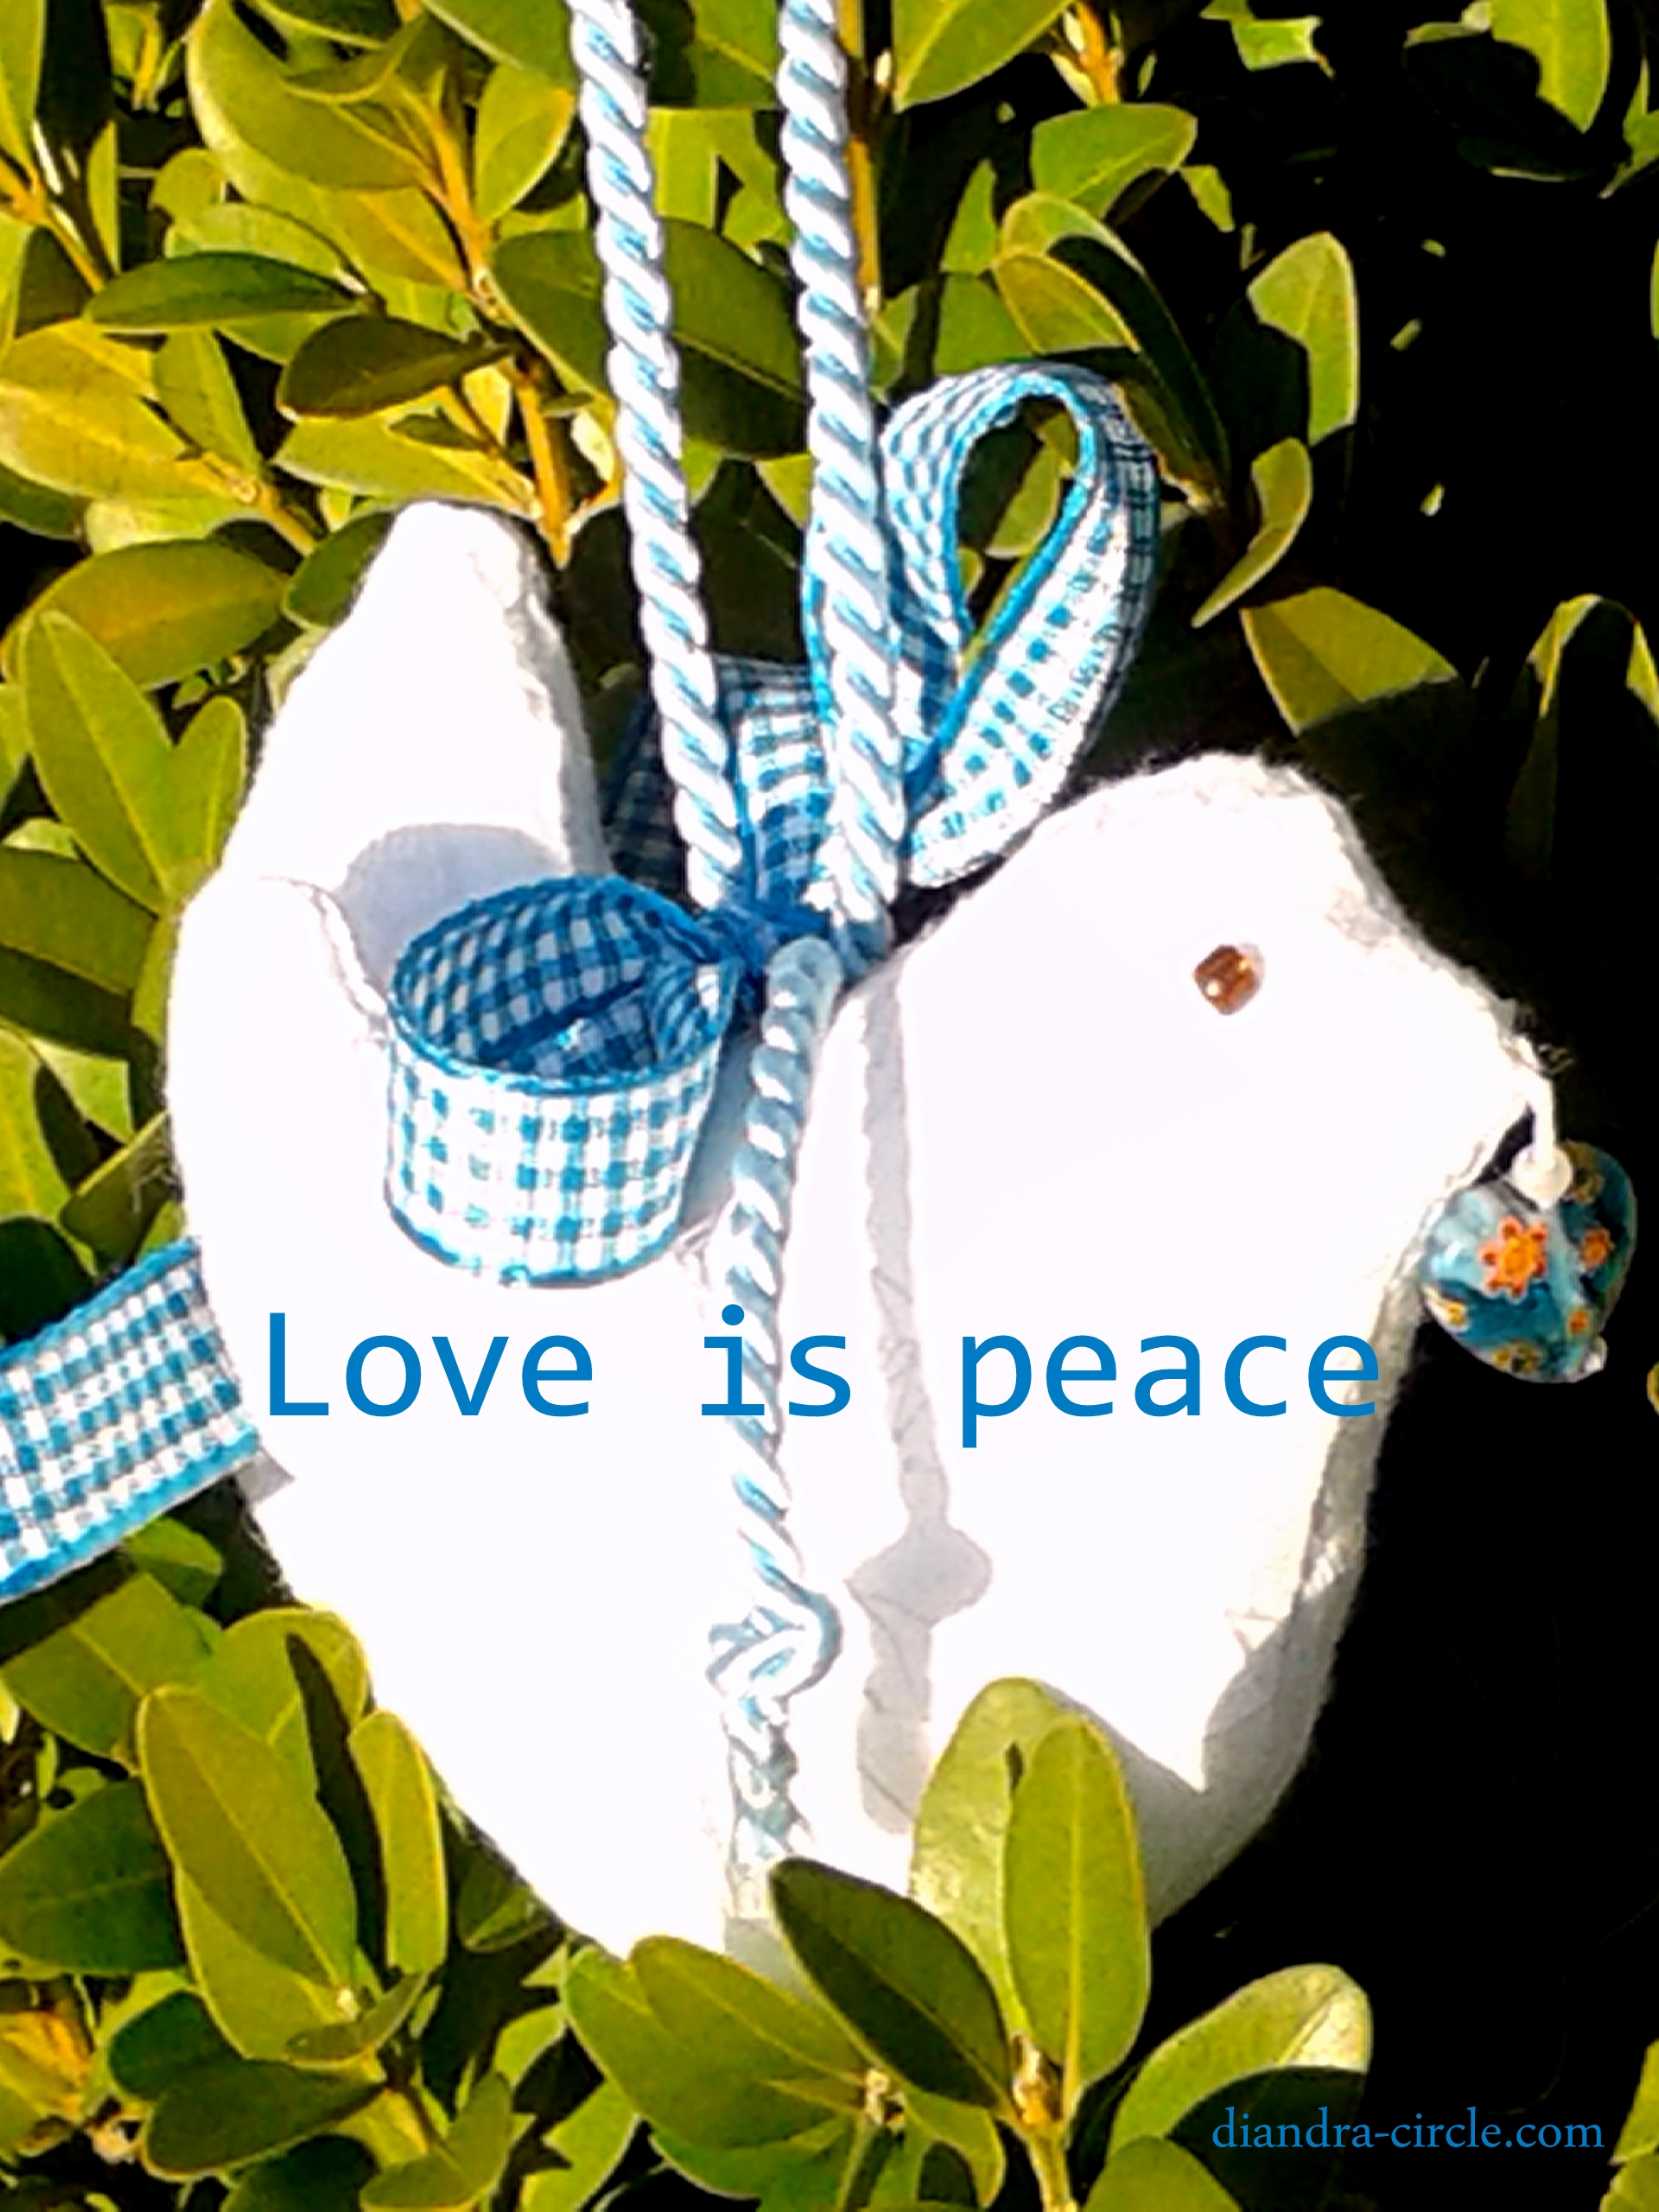 Love us peace